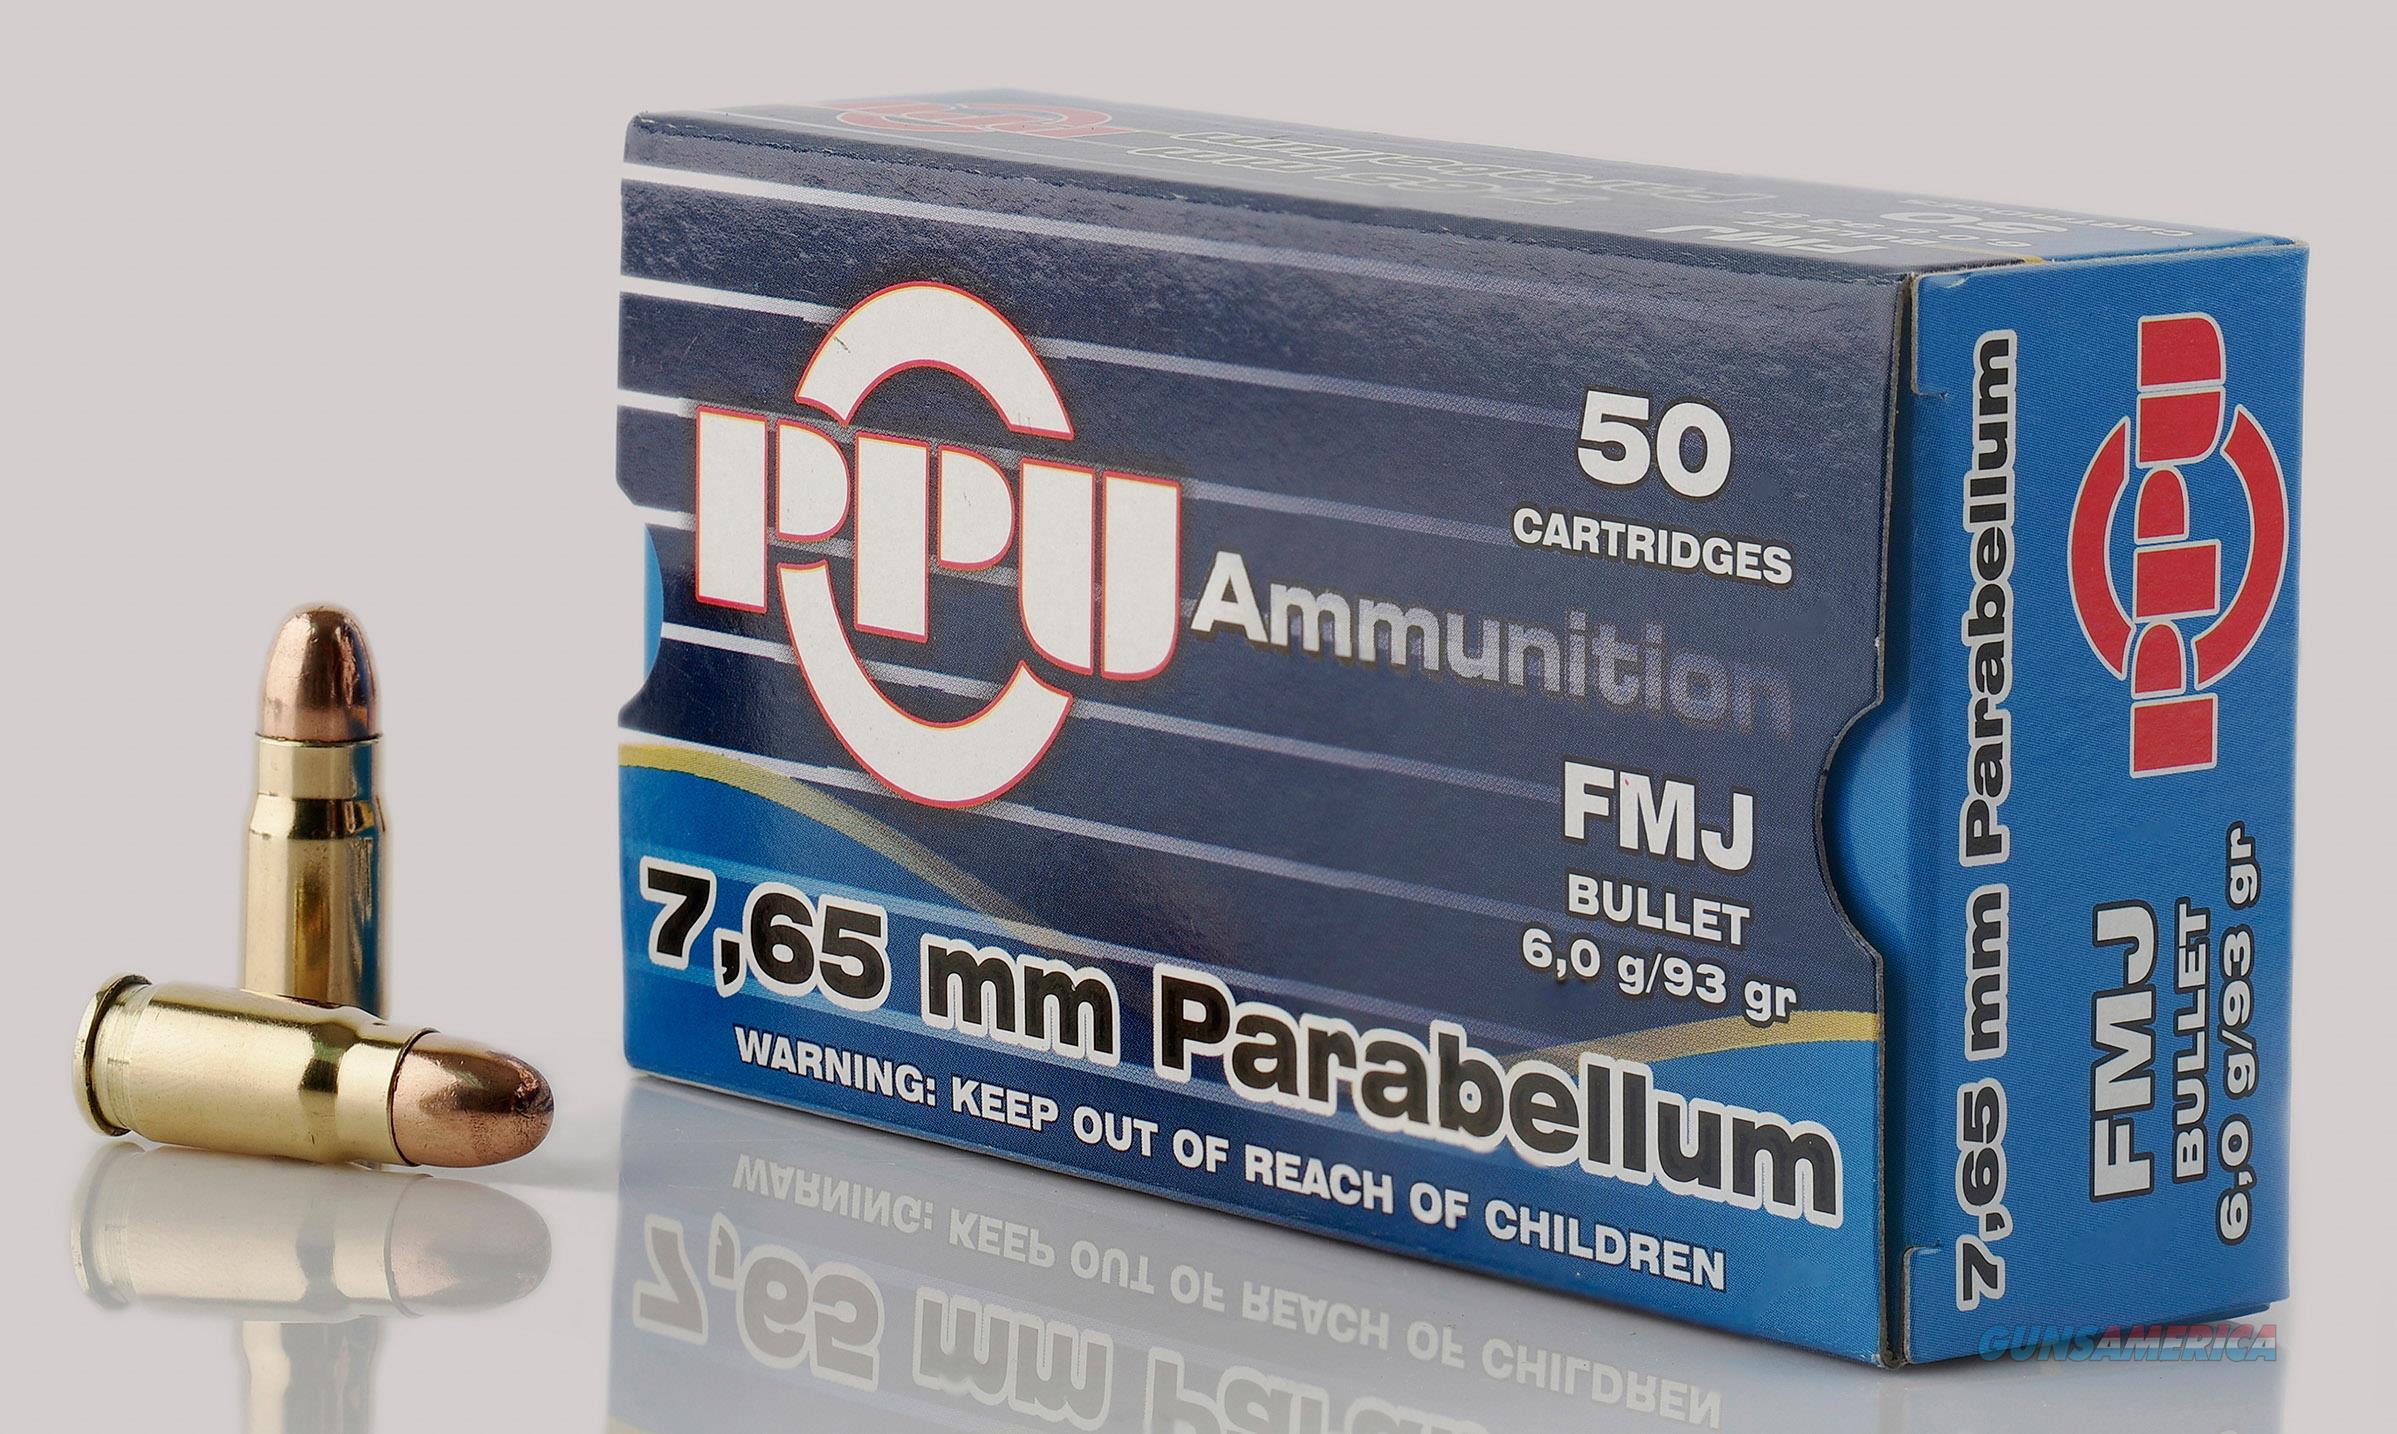 Ppu Handgun, Ppu Pph765p     7.65para     93 Fmj          50-20  Guns > Pistols > 1911 Pistol Copies (non-Colt)